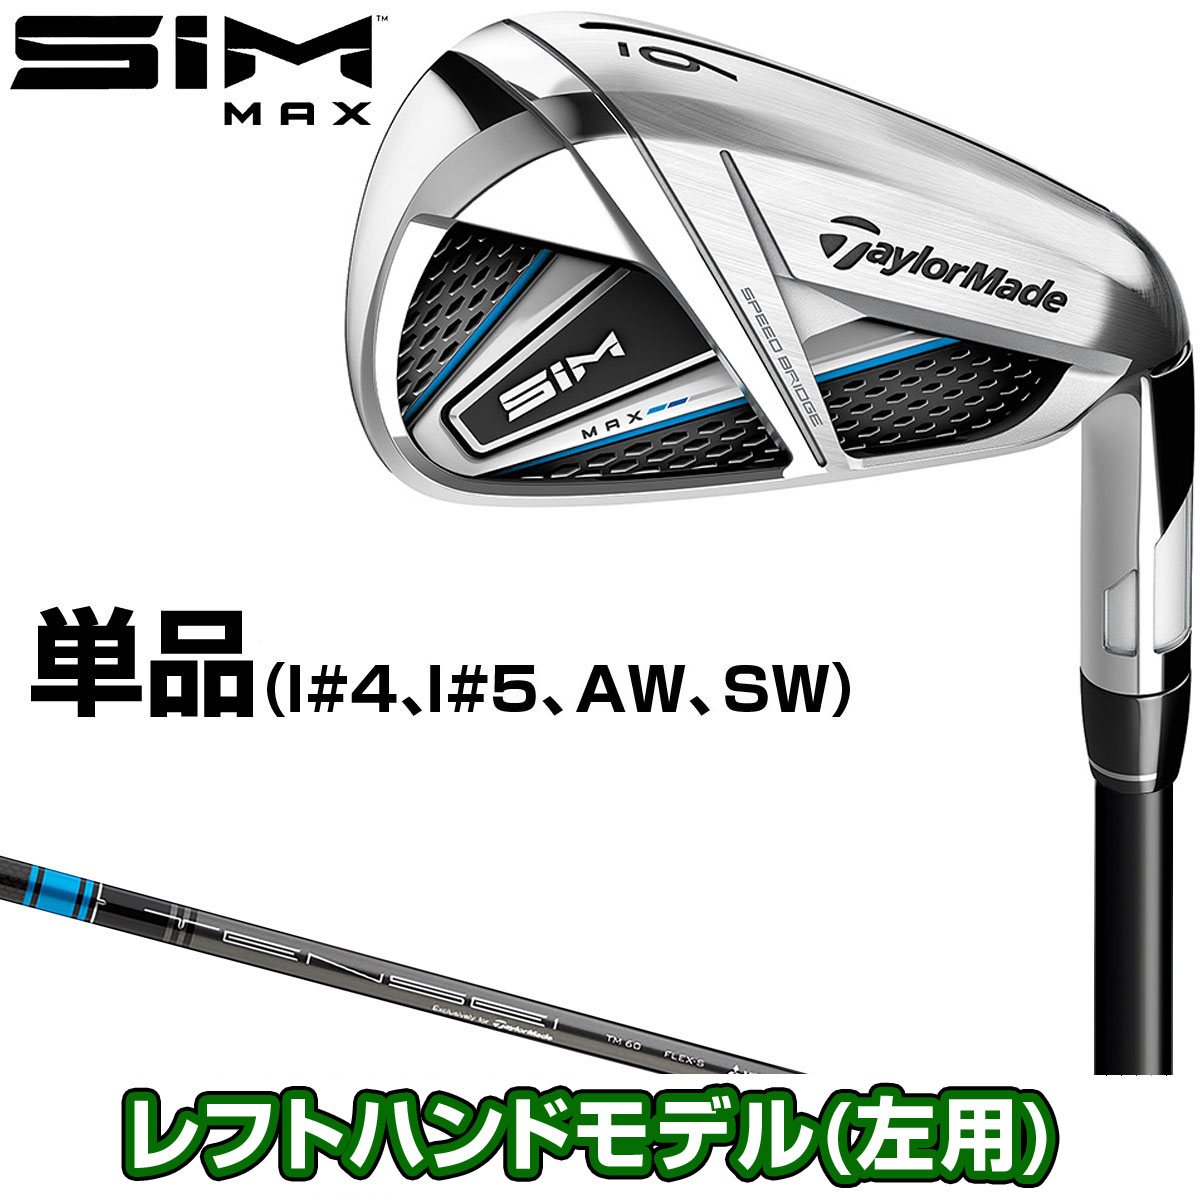 TaylorMade(テーラーメイド)日本正規品 SIM MAX(シムマックス)アイアン 2020新製品 TENSEI BLUE TM60カーボンシャフト 単品(I#4、I#5、AW、SW) 「レフトハンドモデル(左用)」 【あす楽対応】